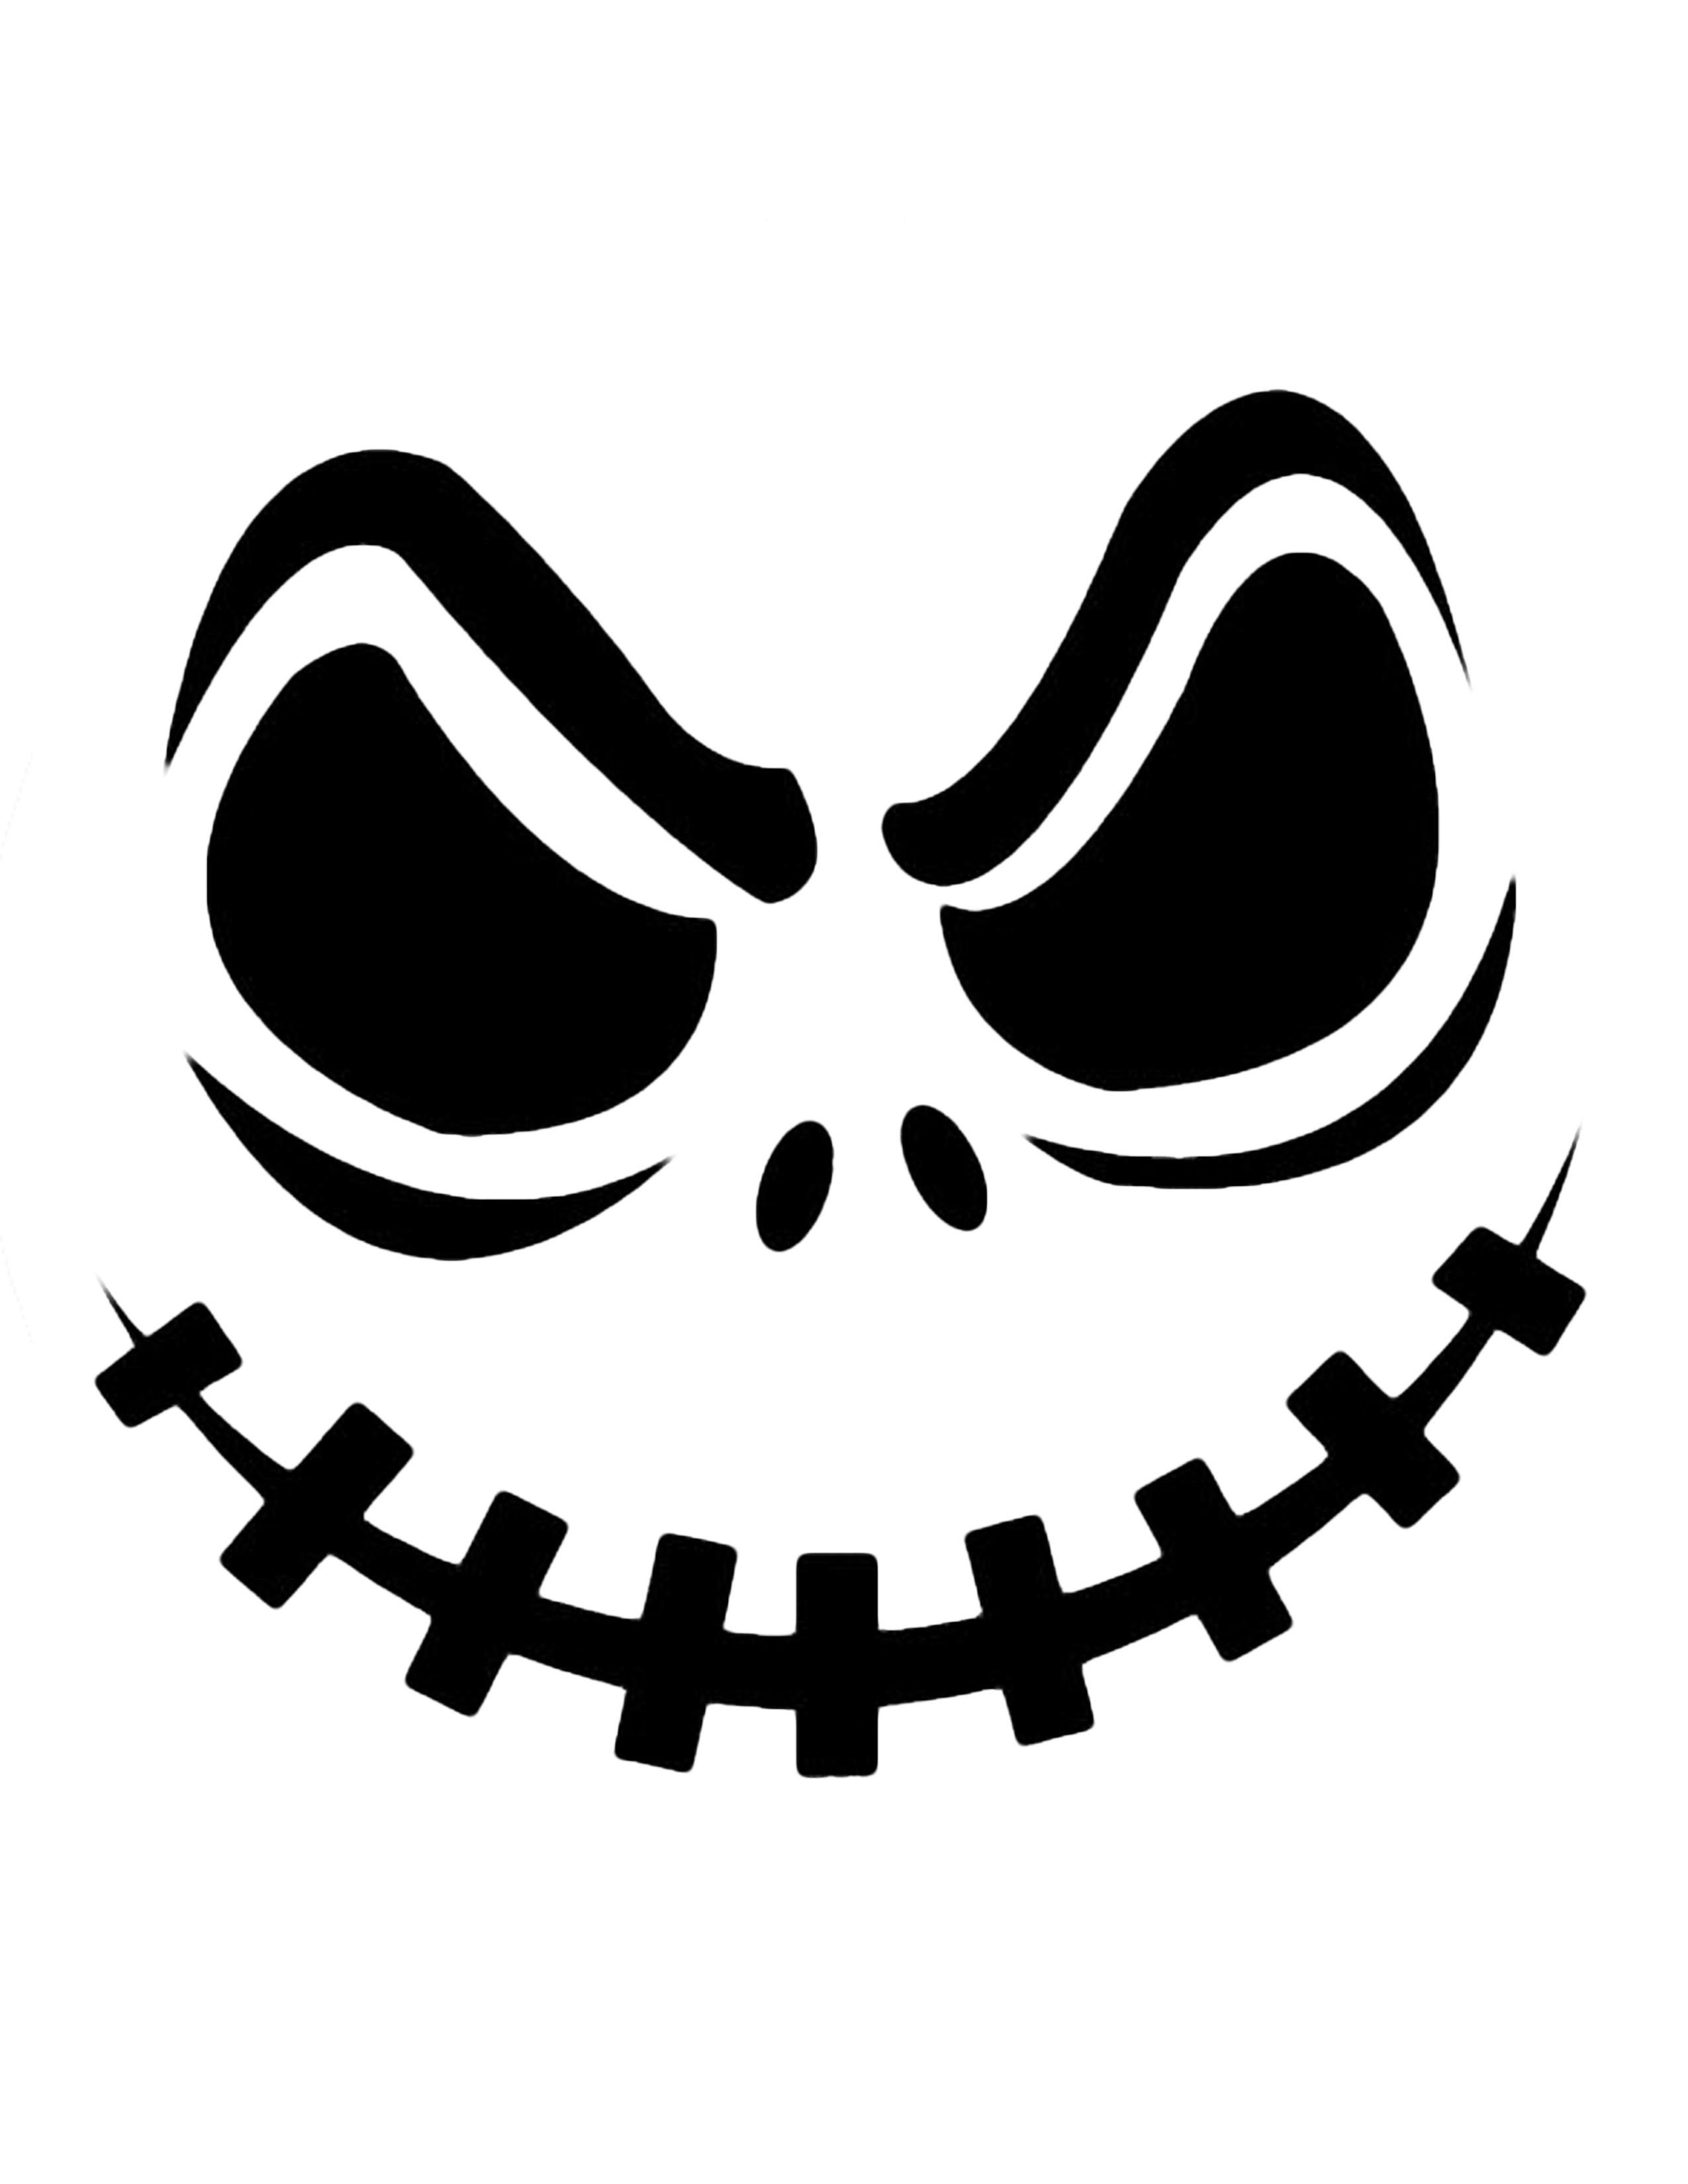 Pumpkin Black And White Clip Art Pumpkin Pie Wikiclipart